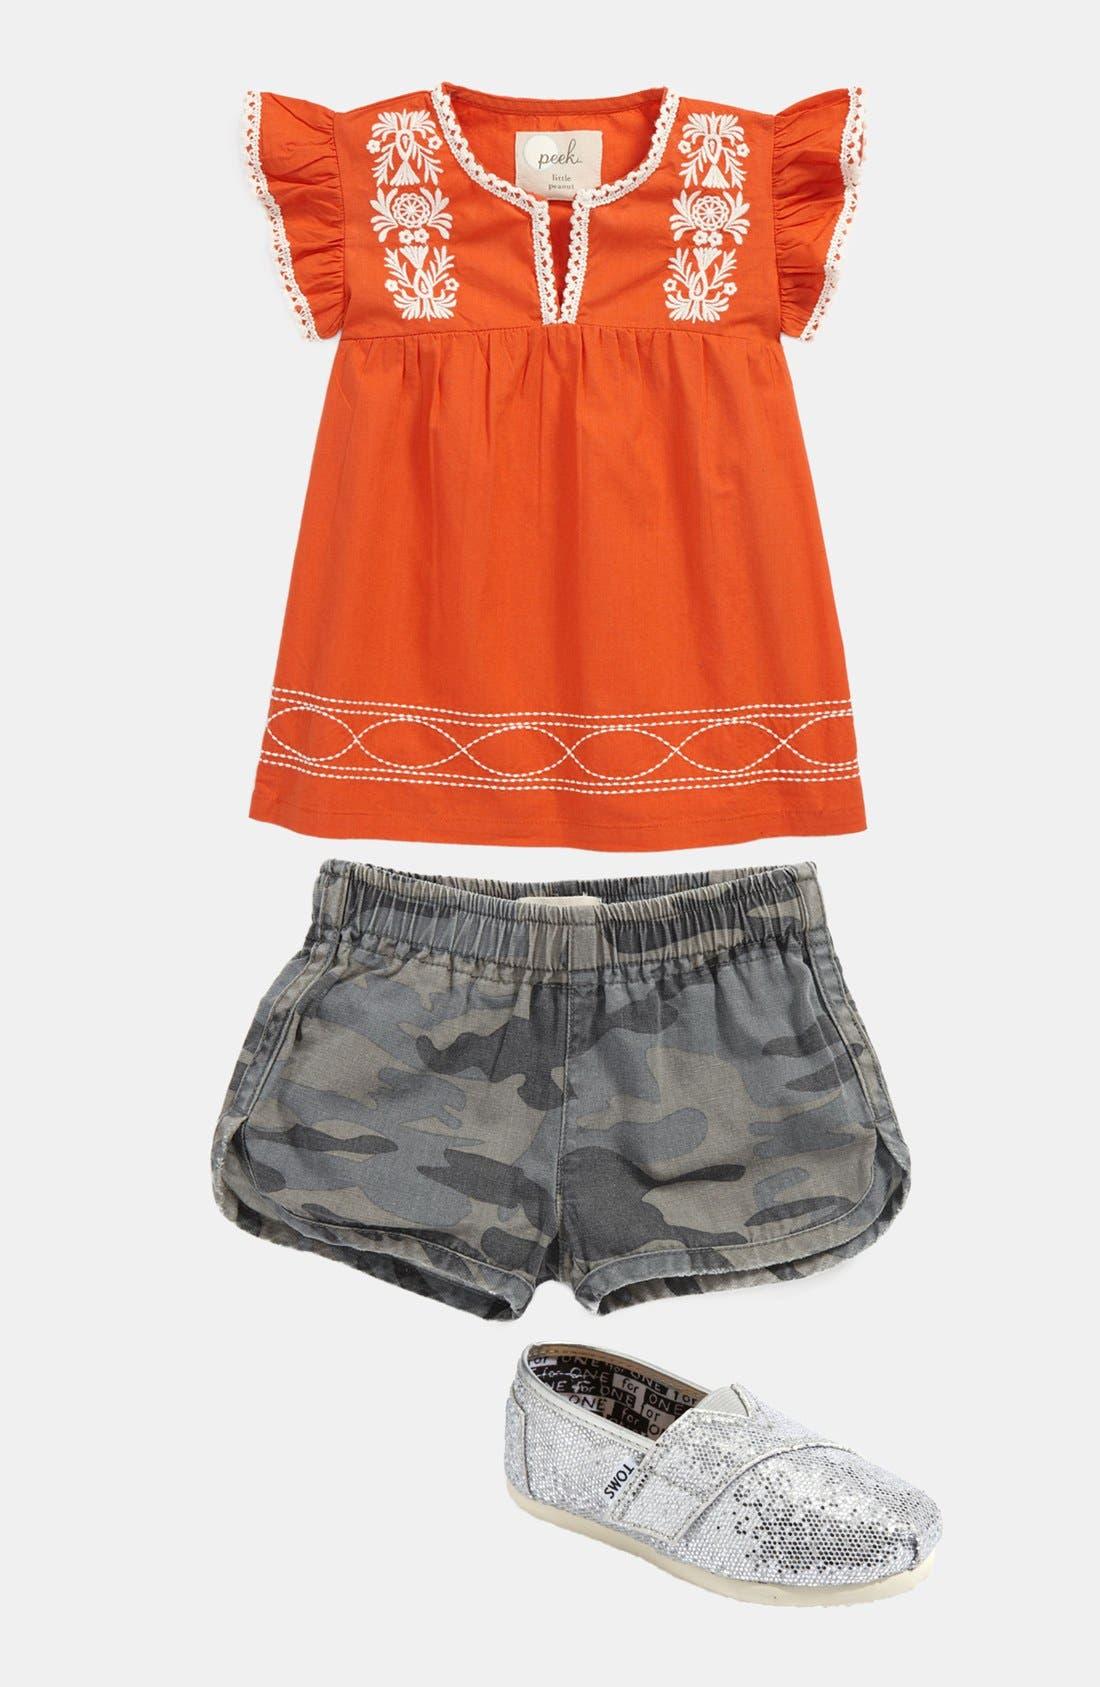 Alternate Image 1 Selected - Peek Dress & Shorts, TOMS Slip-On